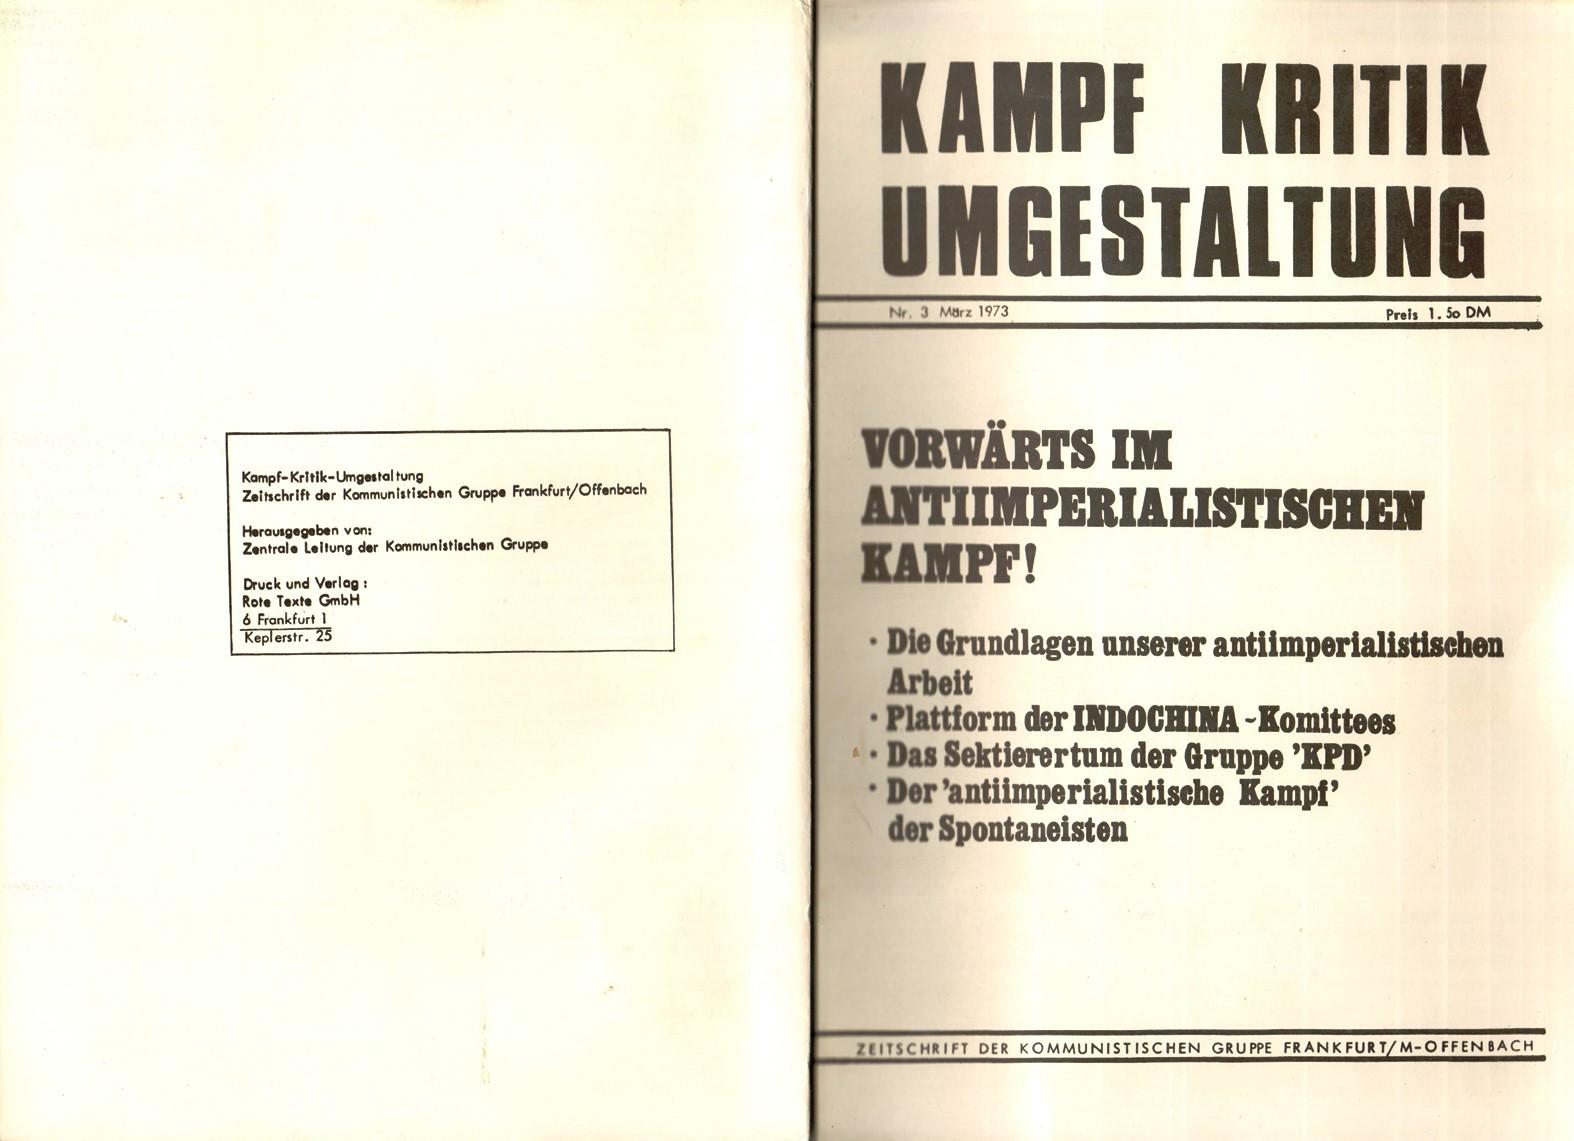 Frankfurt_Offenbach_KG_Kampf_Kritik_Umgestaltung_1973_03_01